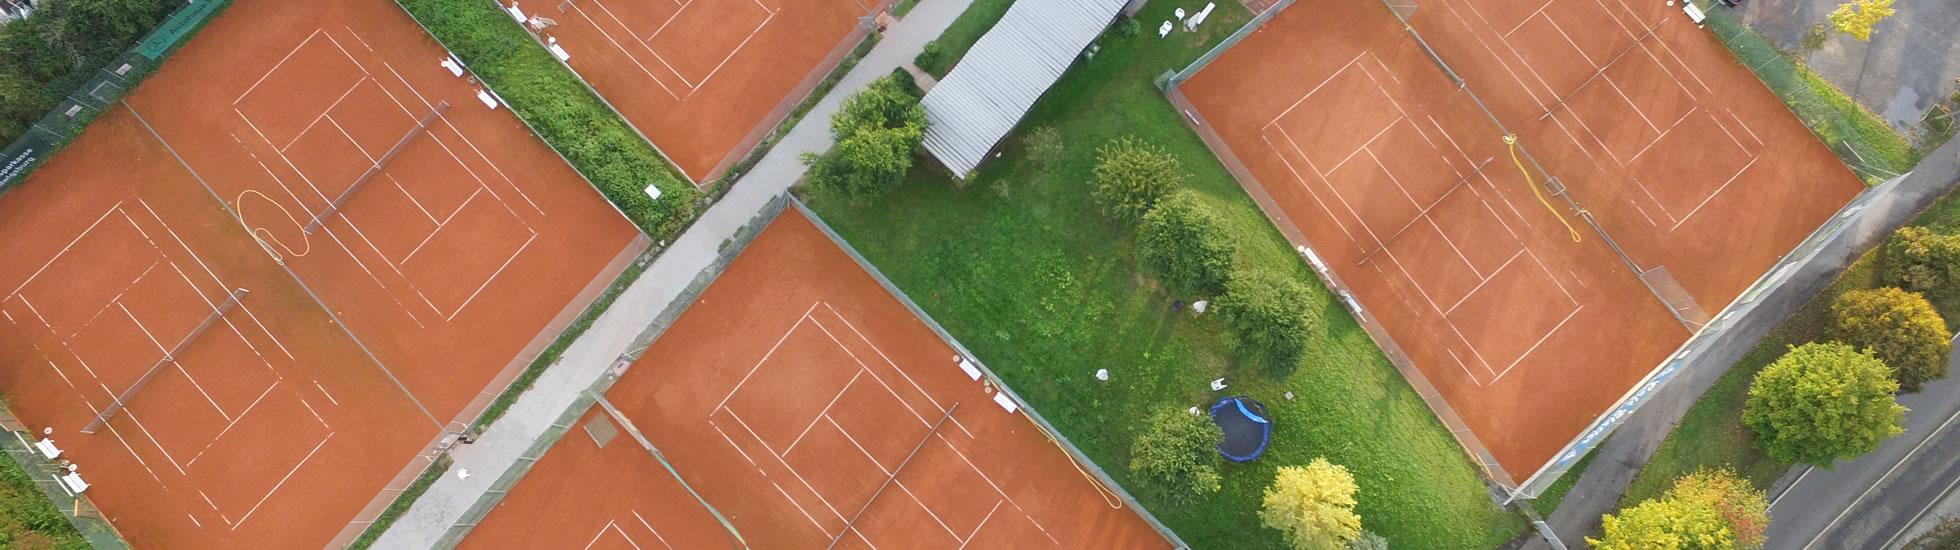 Luftbild Tennisplätze TKB